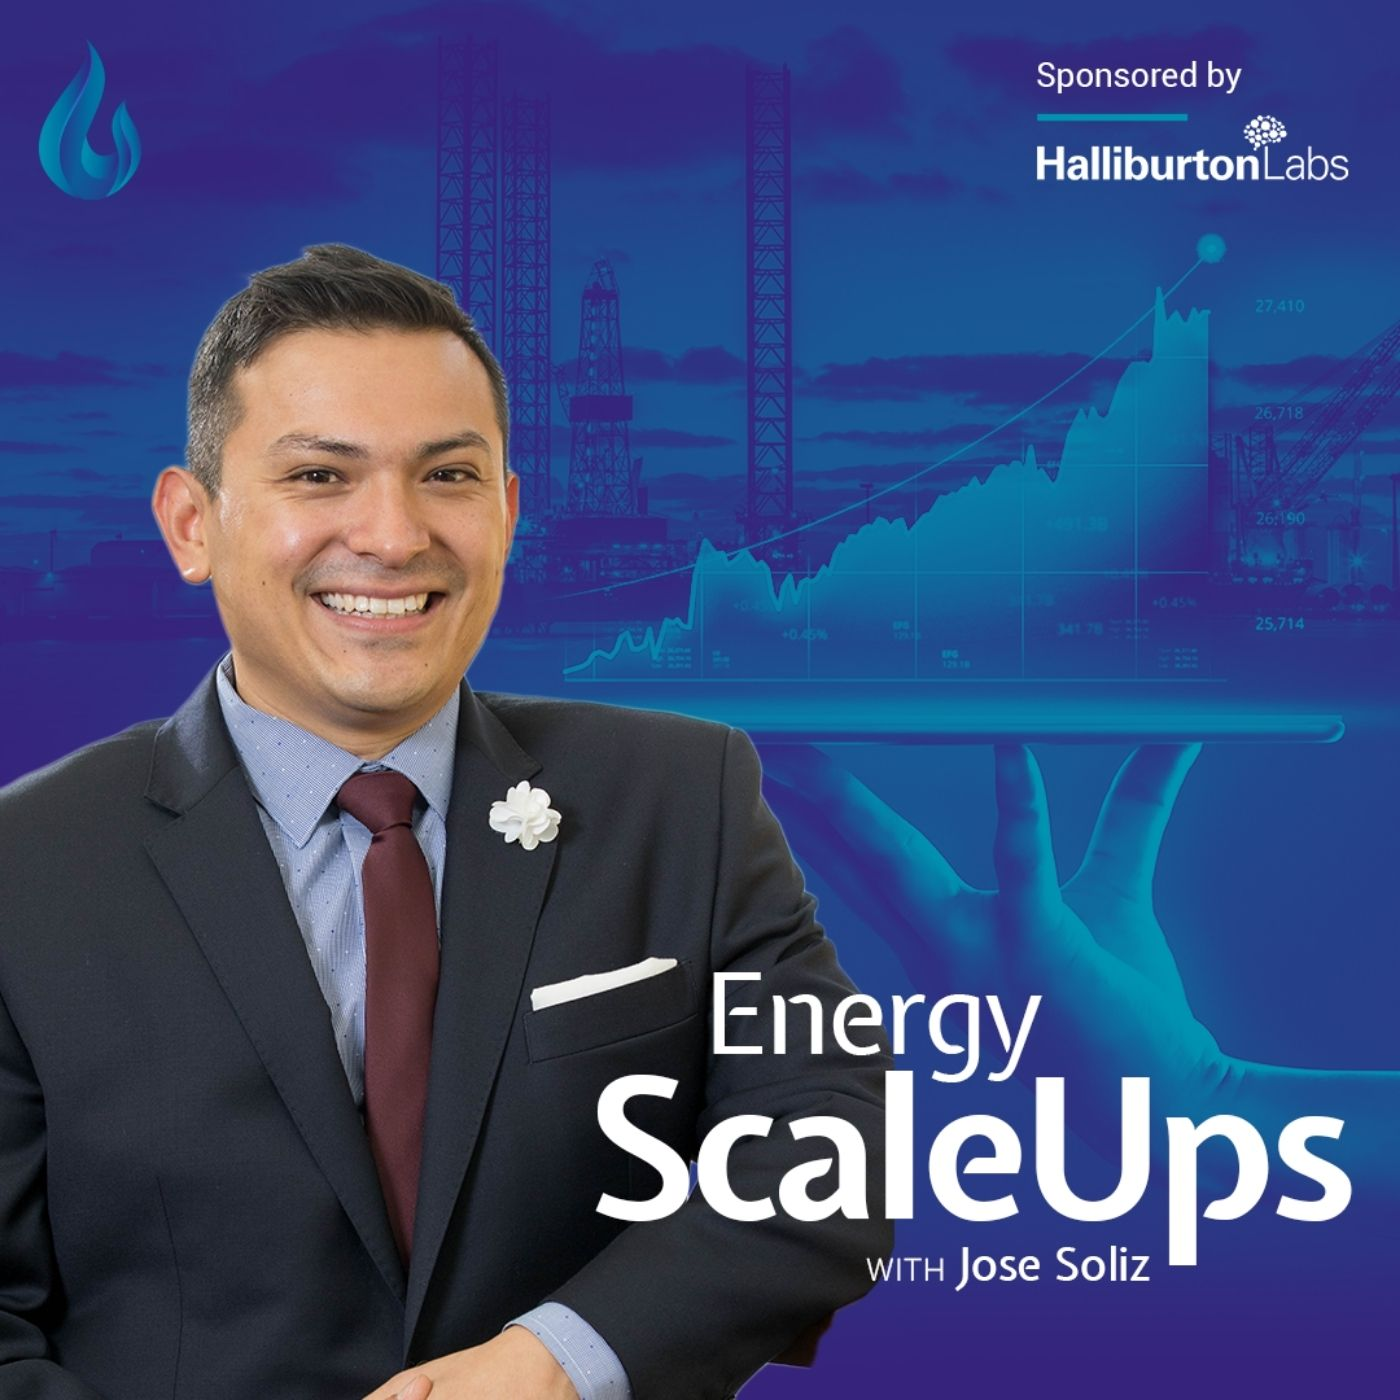 Energy ScaleUps